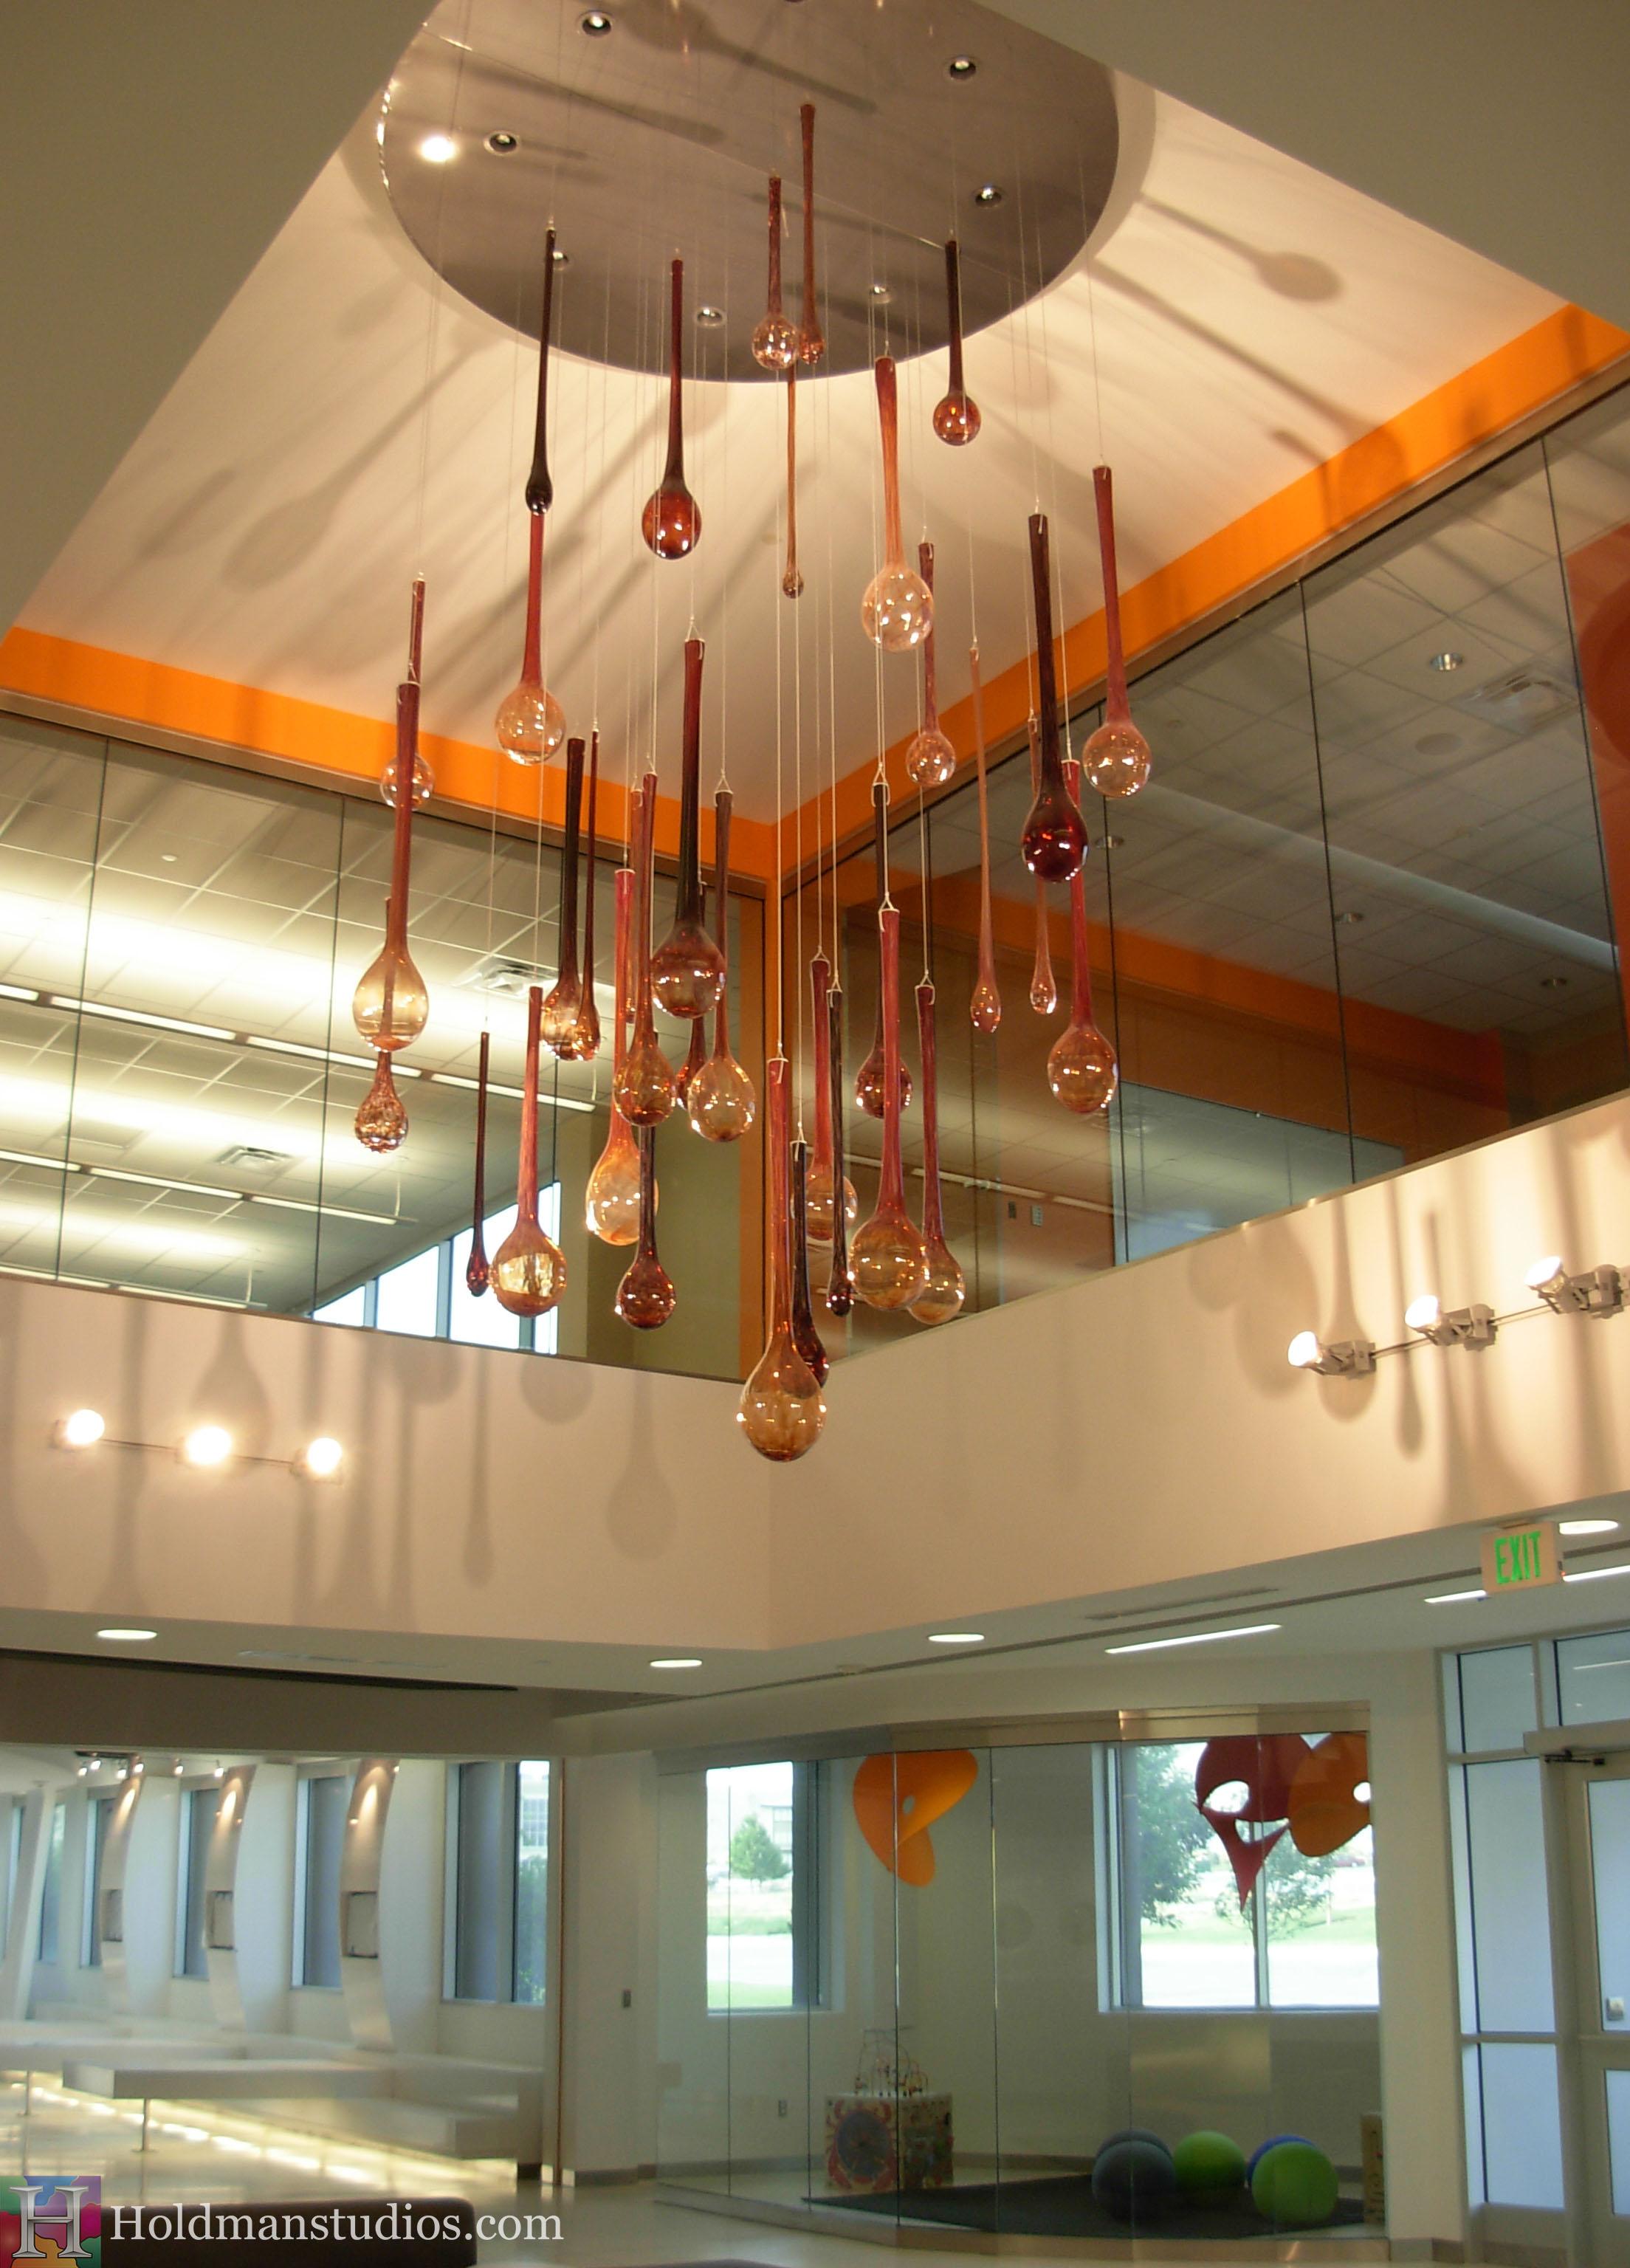 Holdman-studios-hand-blown-glass-xango-chandelier.jpg